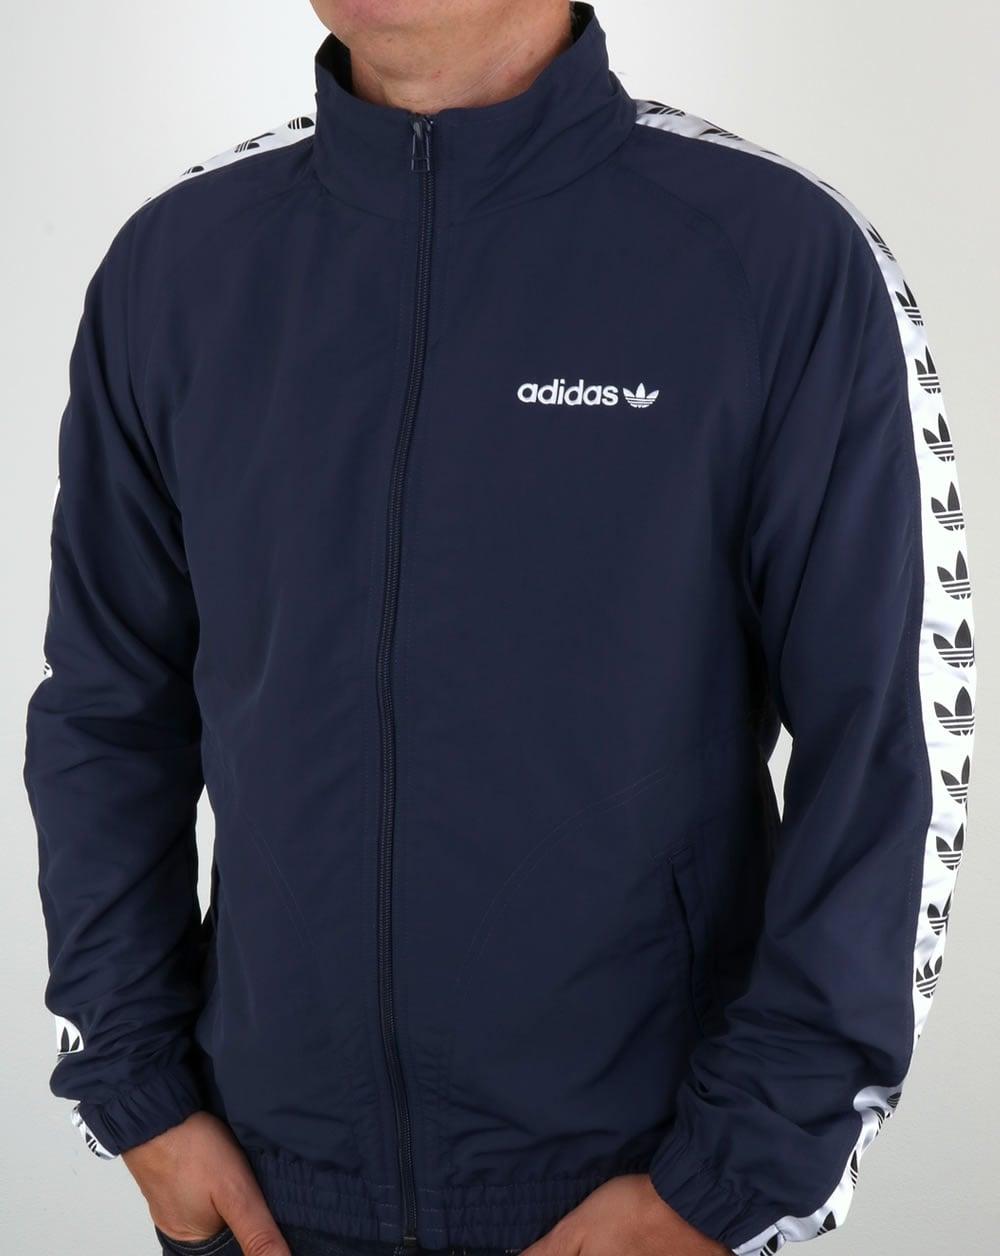 Adidas Originals TNT Tape Wind Jacket Trace BlueWhite